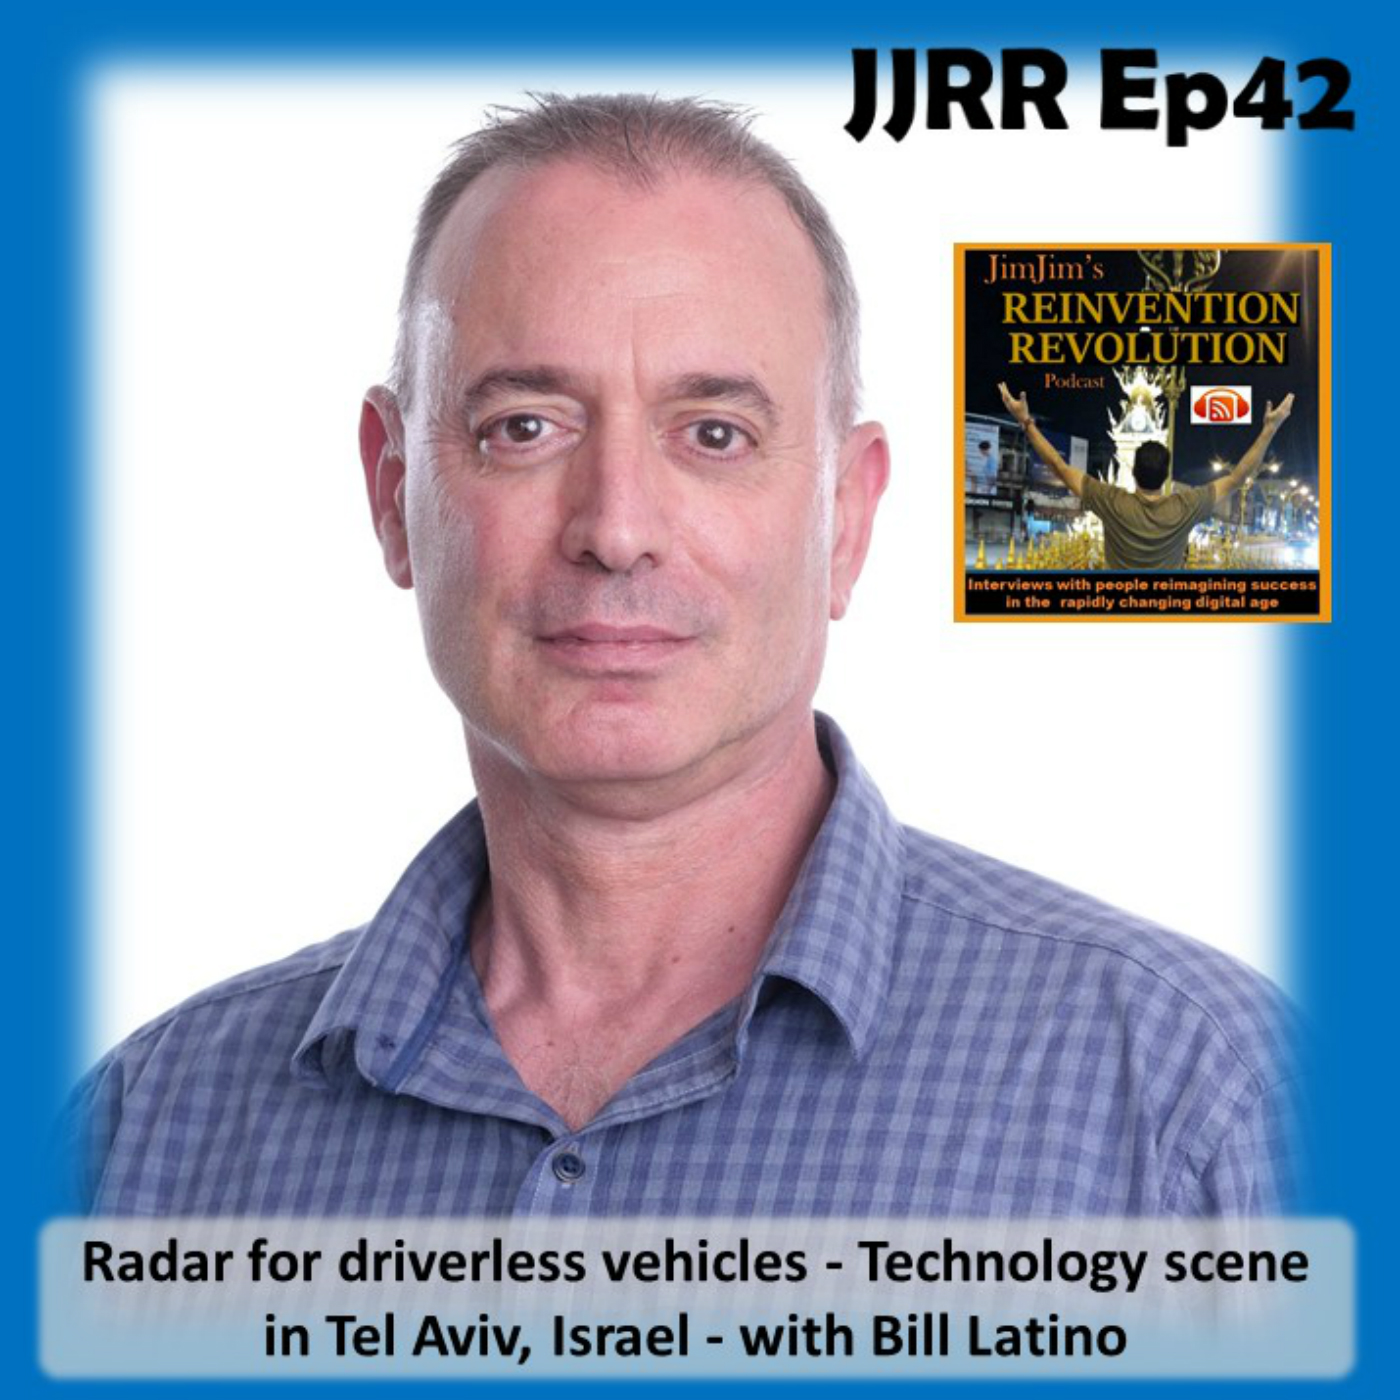 JJRR Ep42 Radar for driverless vehicles – Technology scene in Tel Aviv, Israel – with Bill Latino